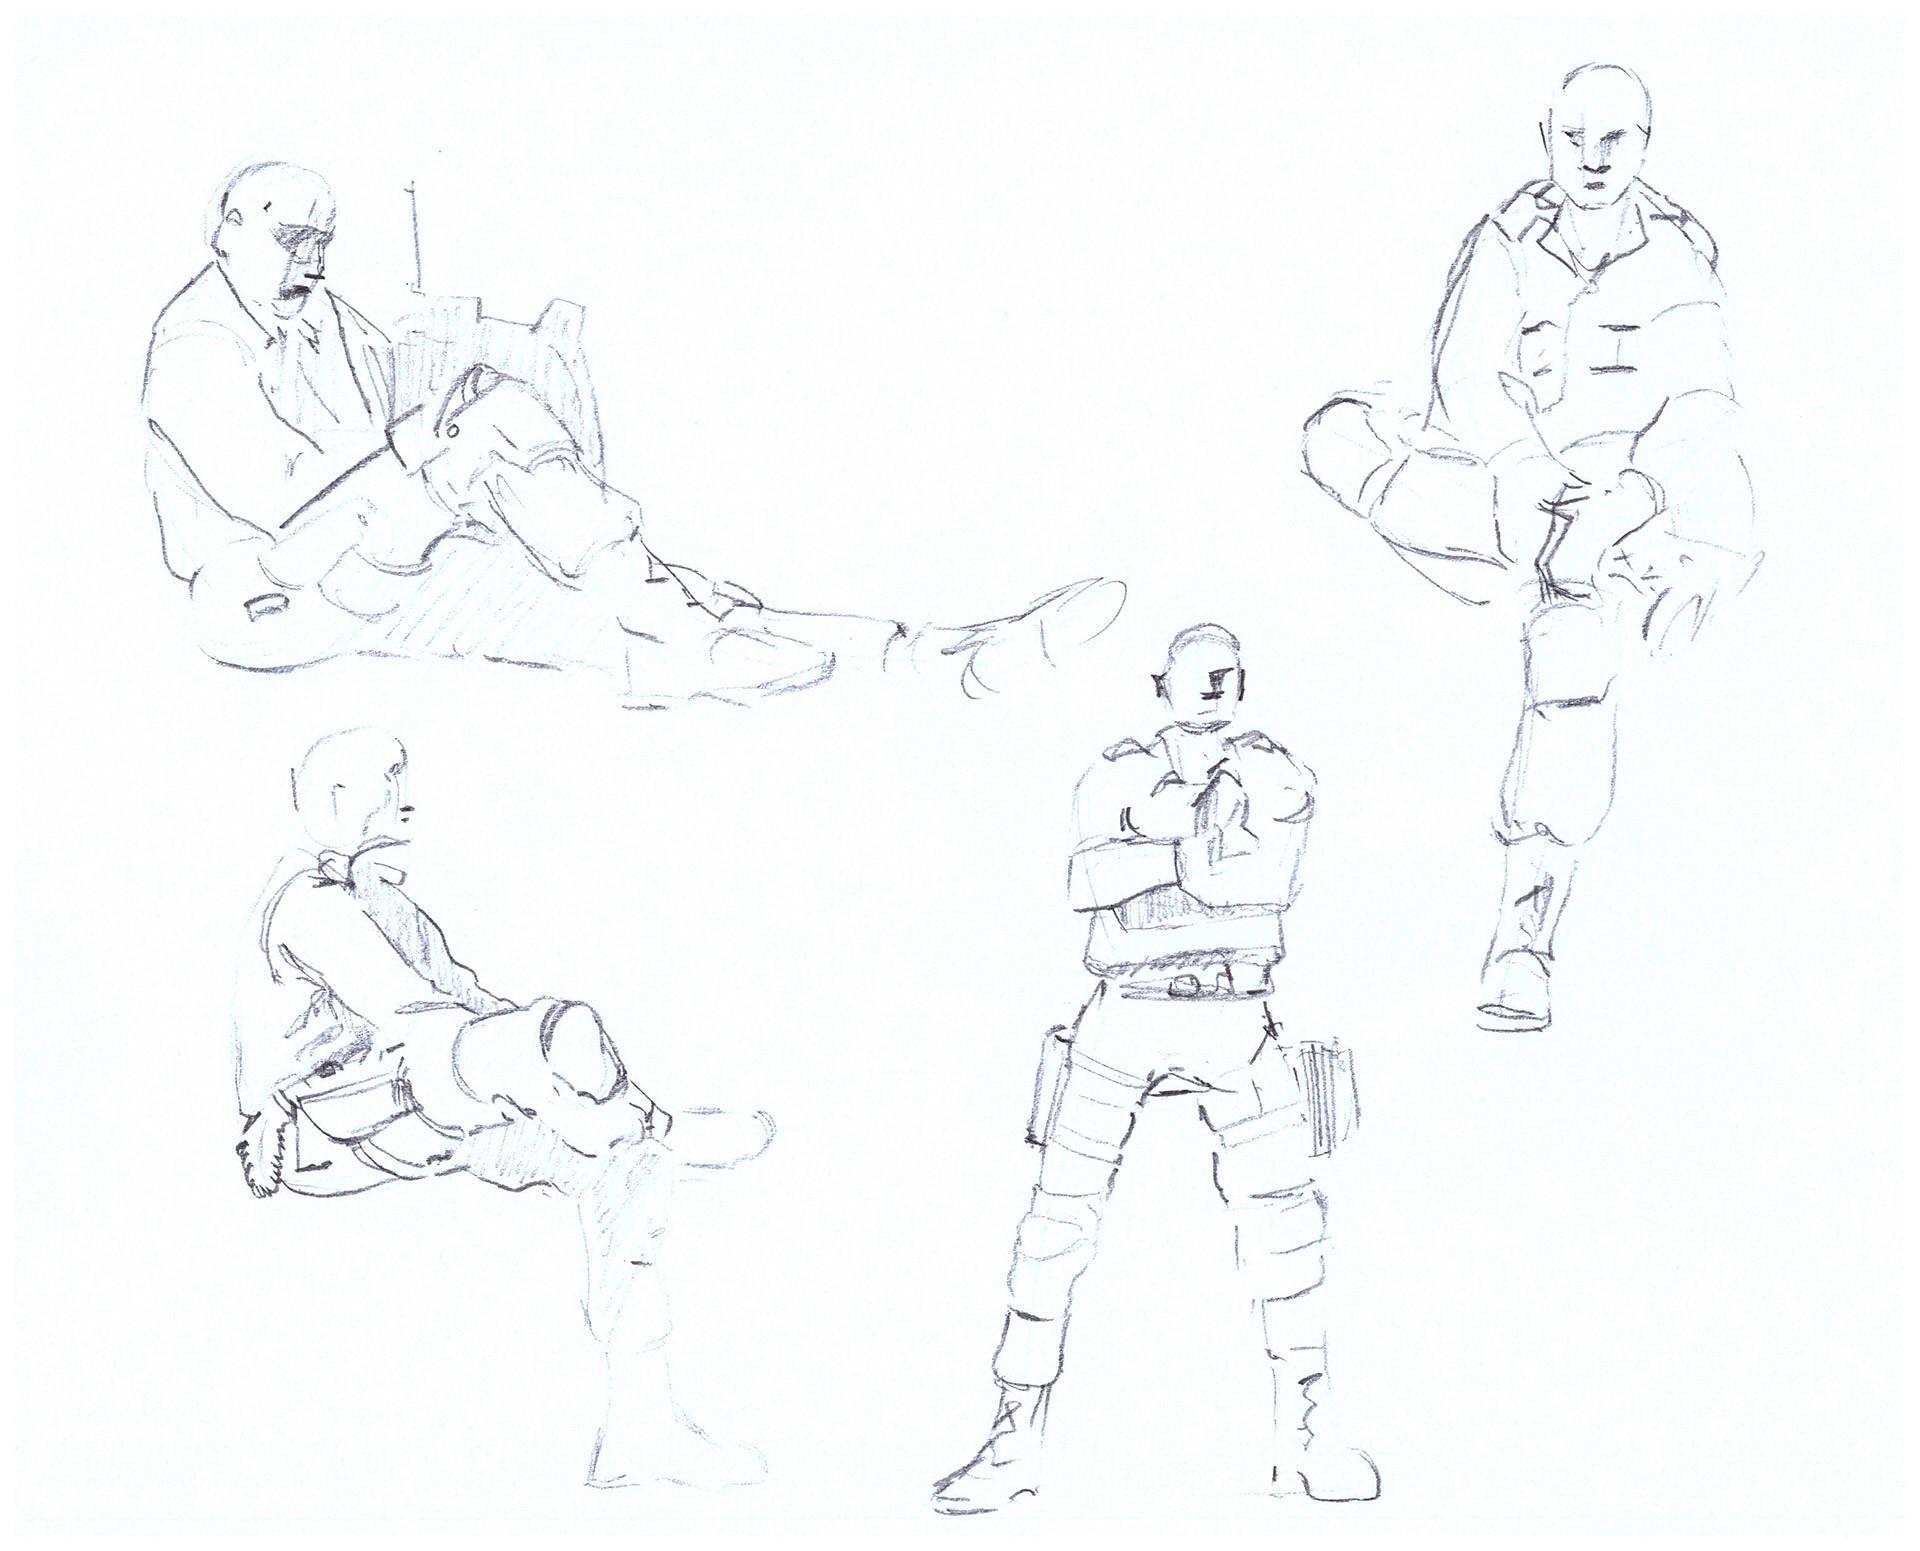 Joachim epper web sketchclub s 2